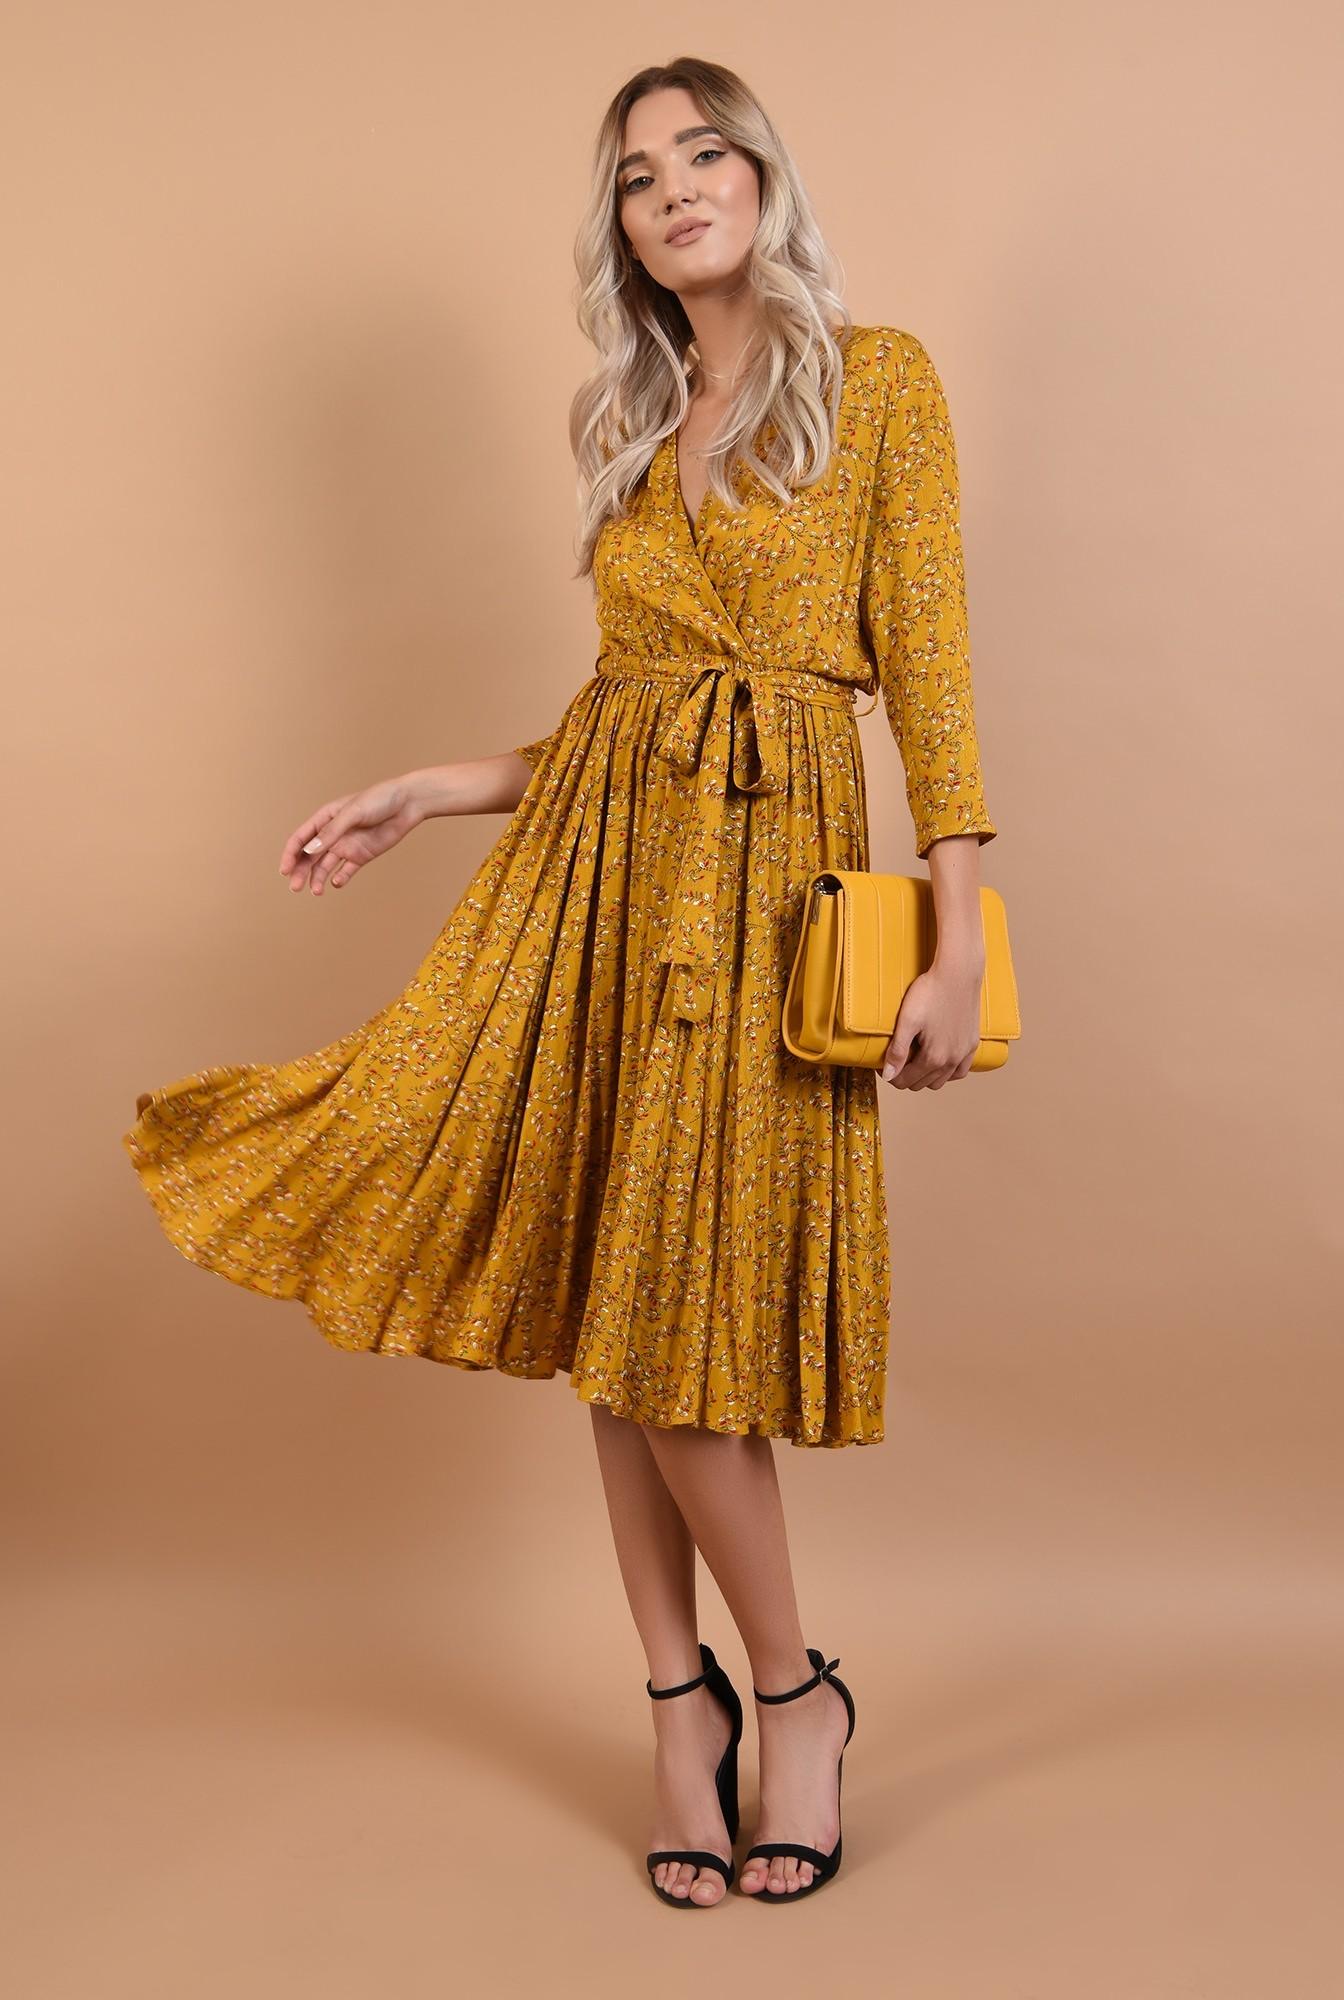 3 - 360 - rochie de toamna, imprimeu floral, mustar, cu cordon, decolteu in V